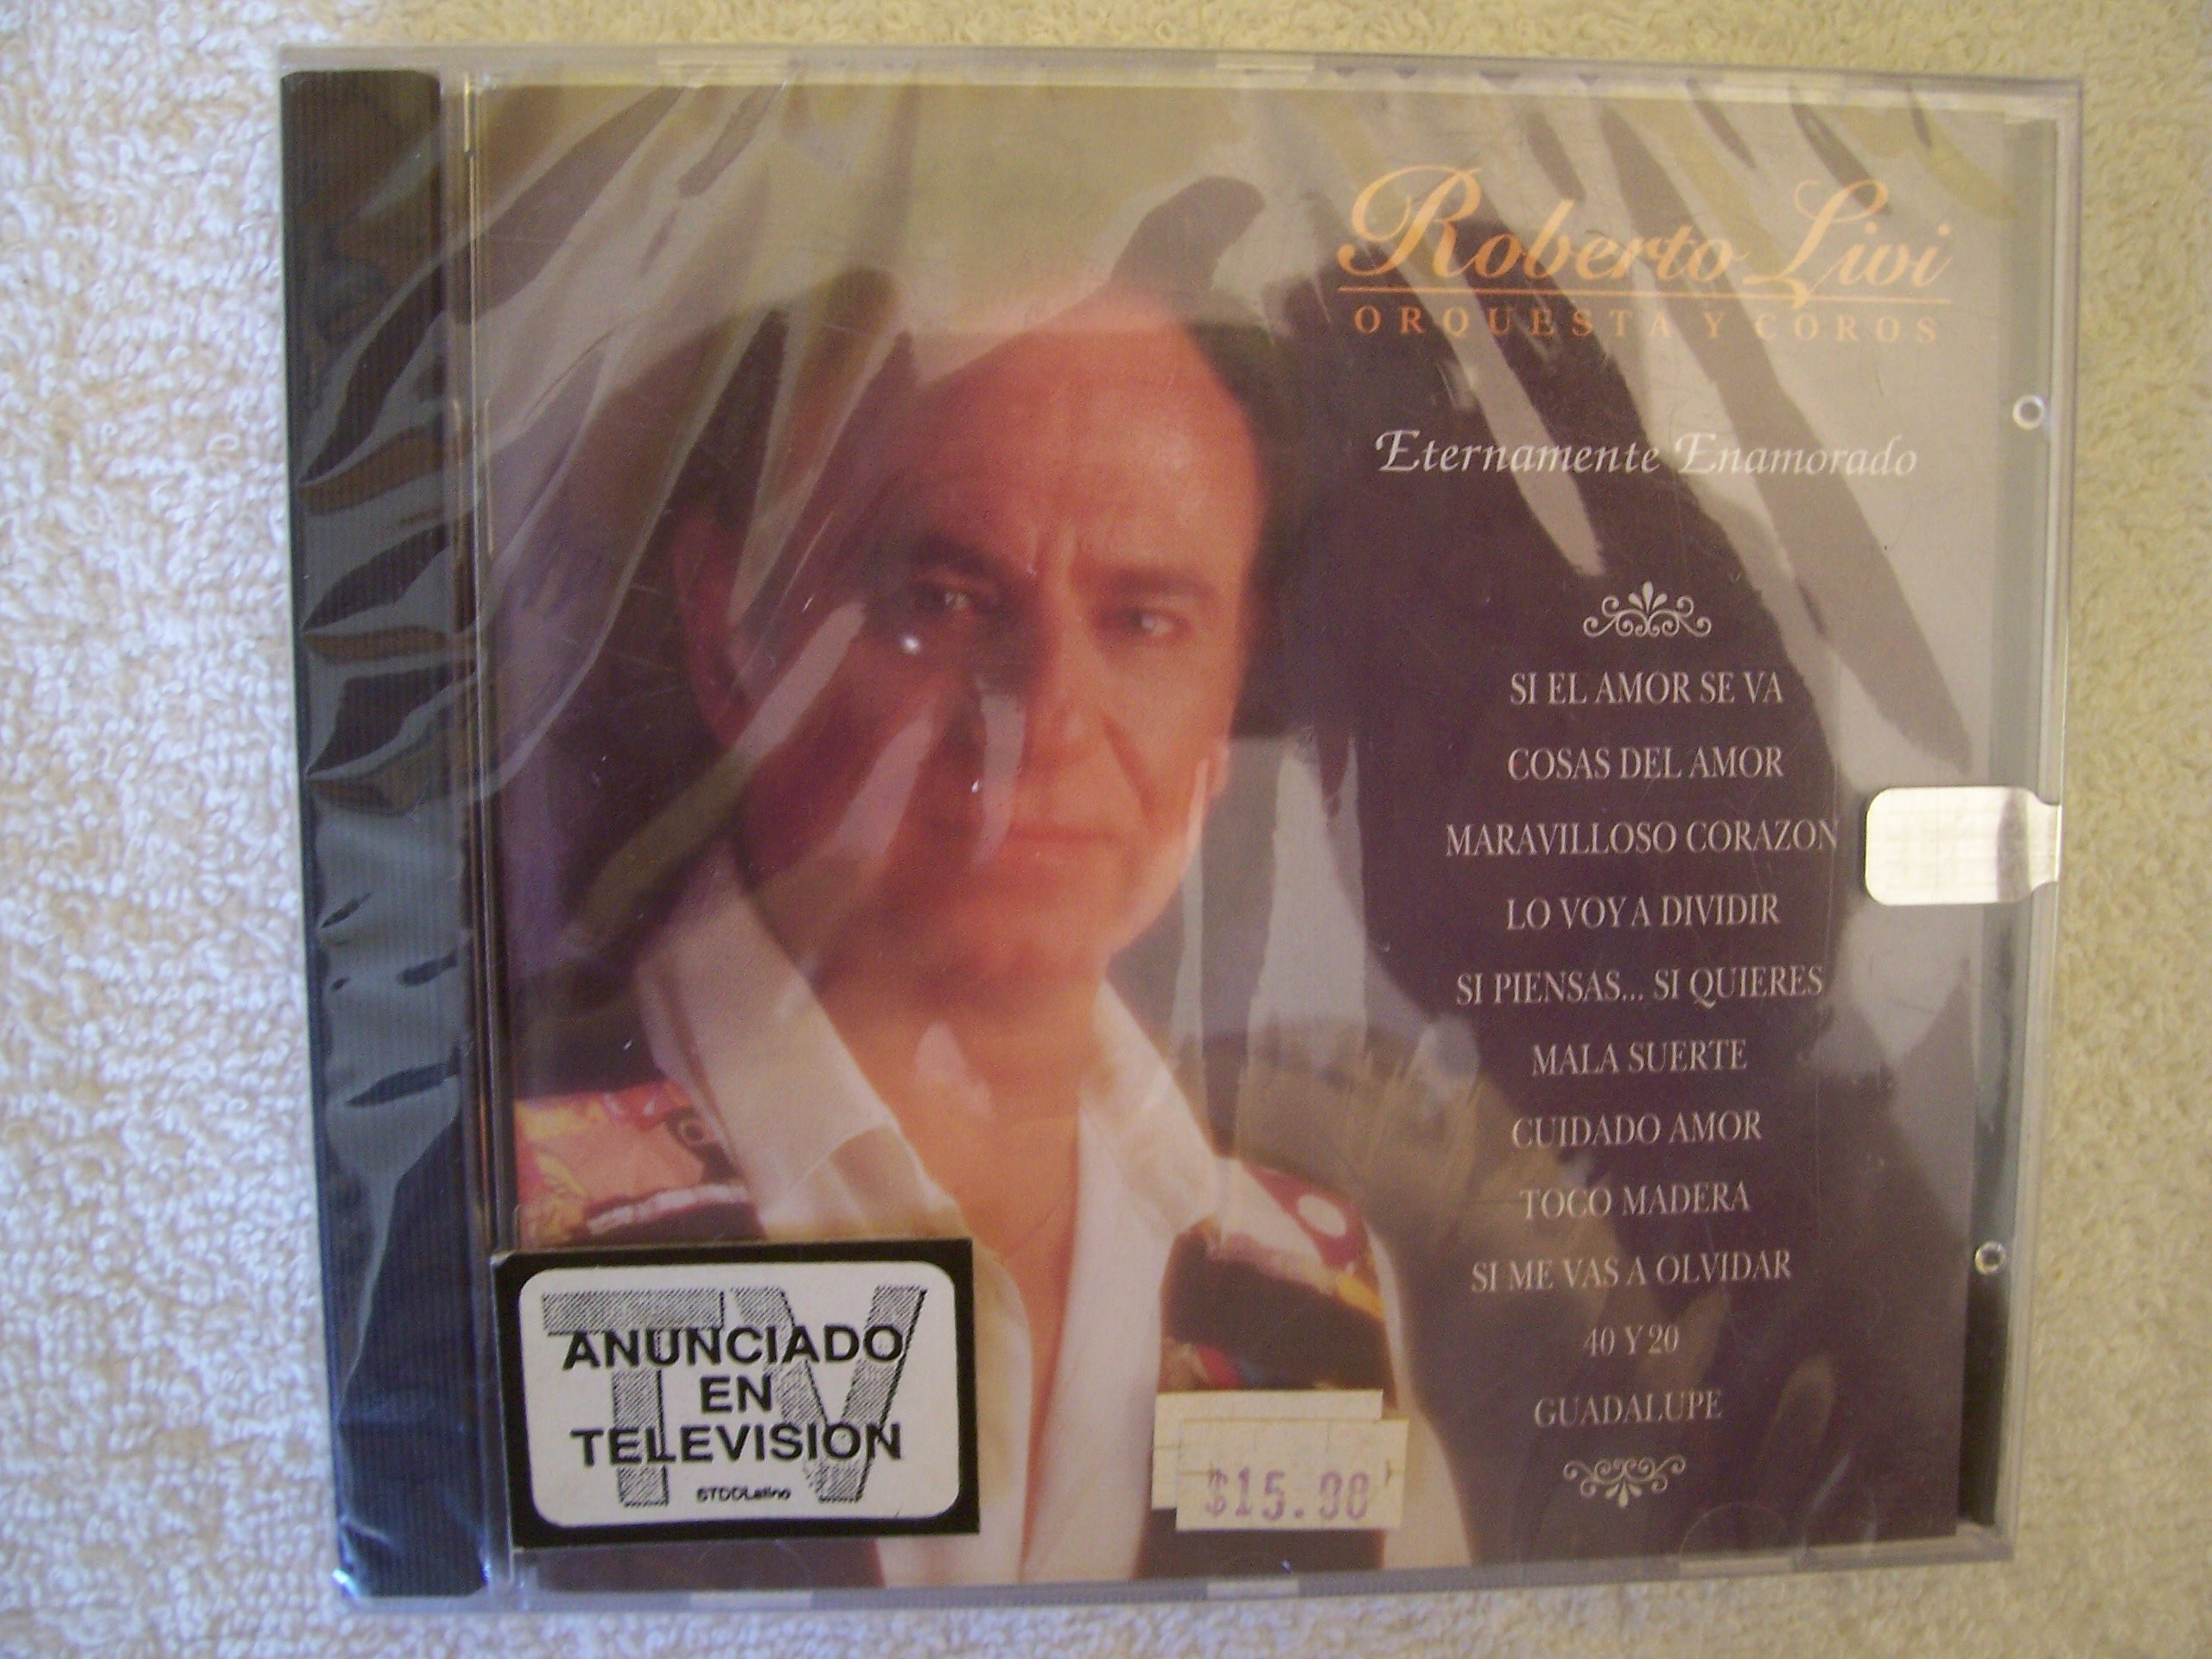 Eternamente Enamorado by Polygram Records